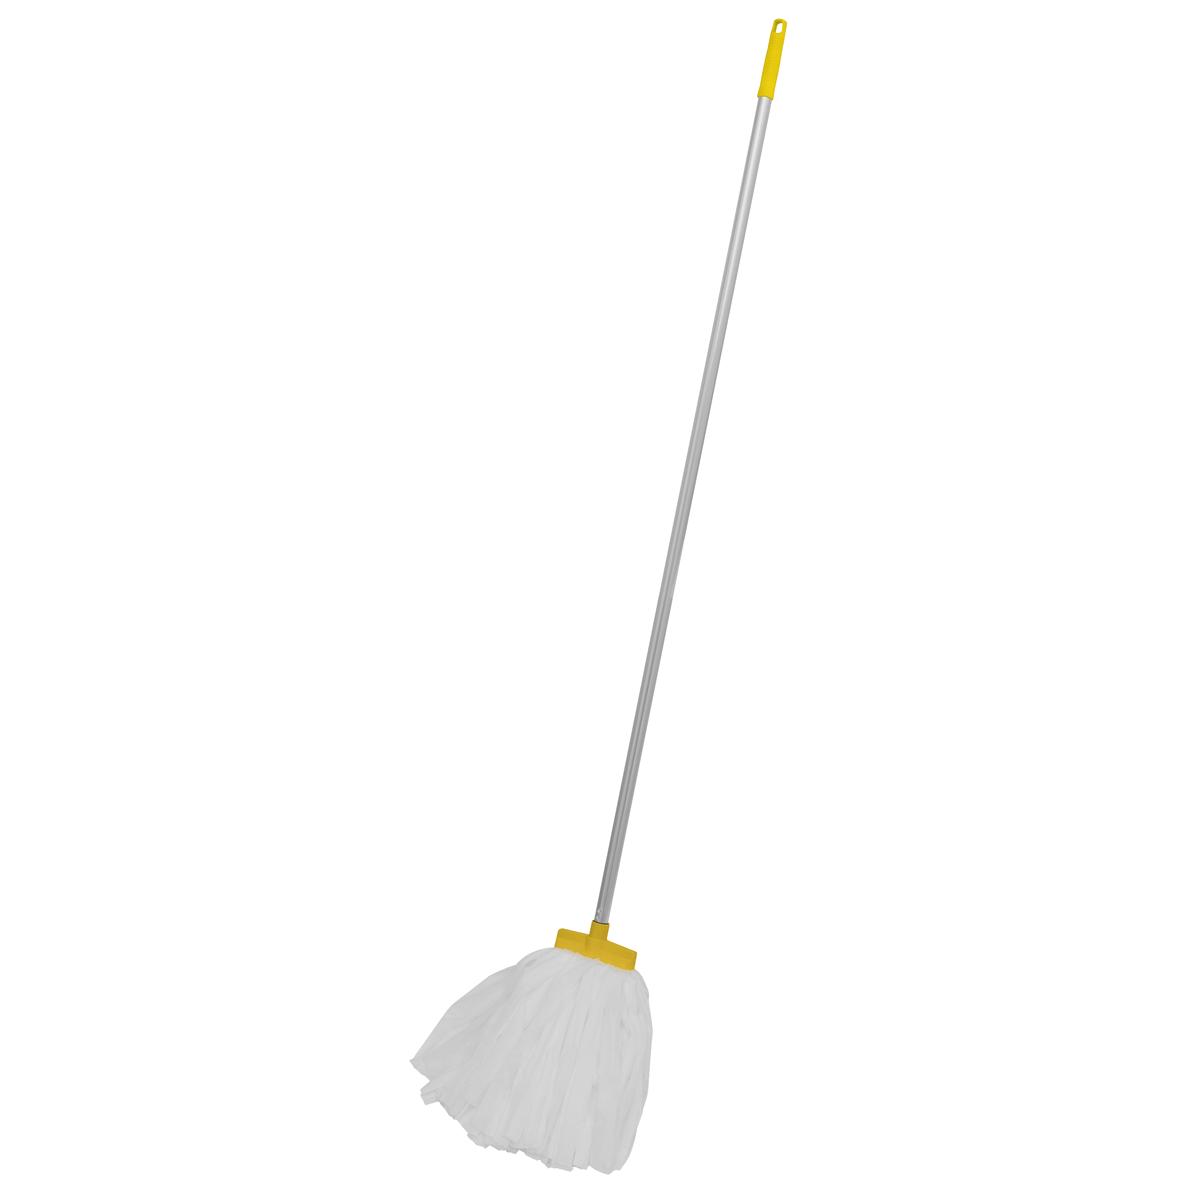 Aluminium Mop with Disposable Head